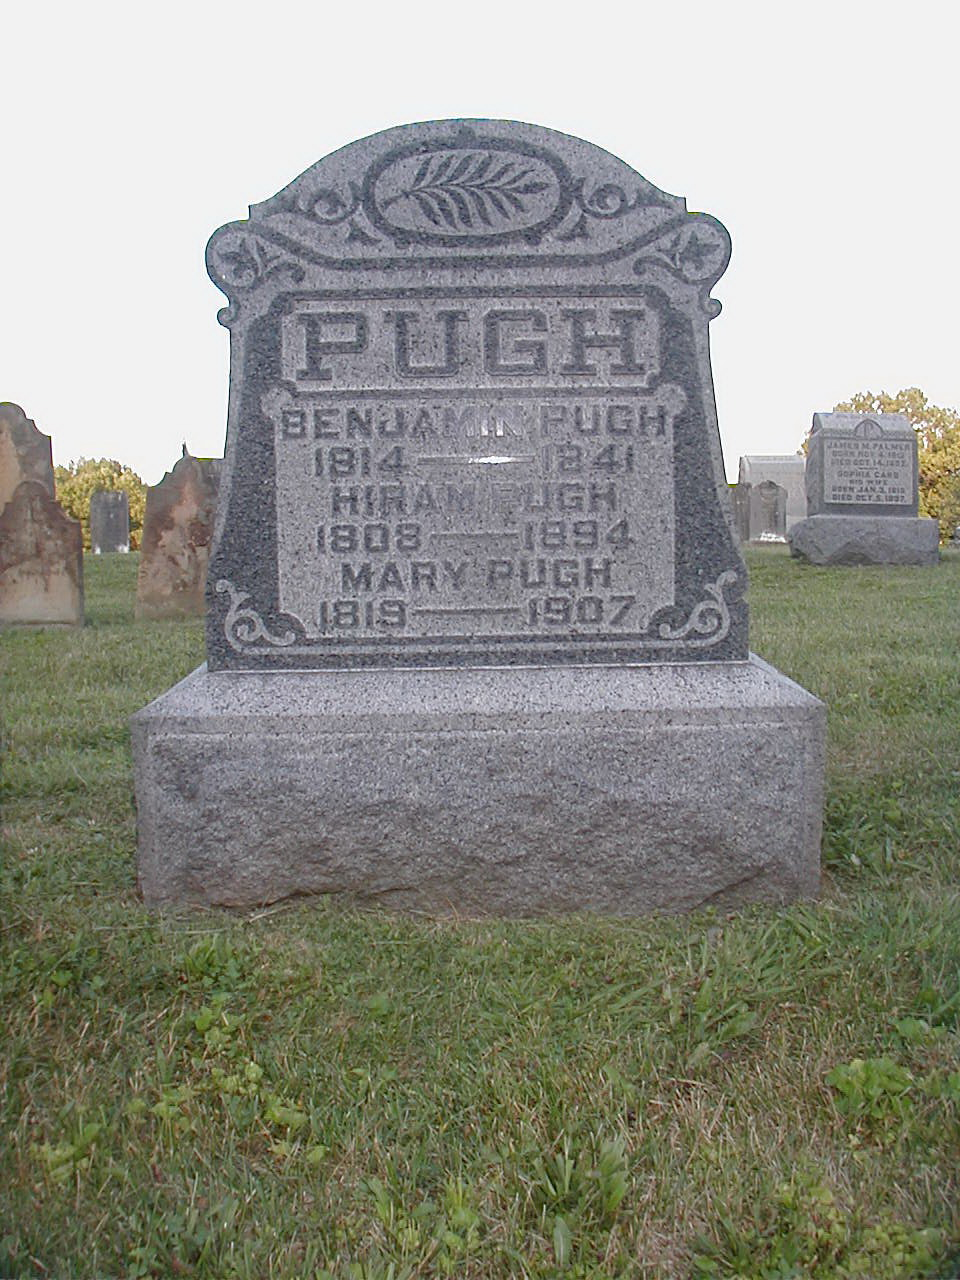 Hiram Pugh